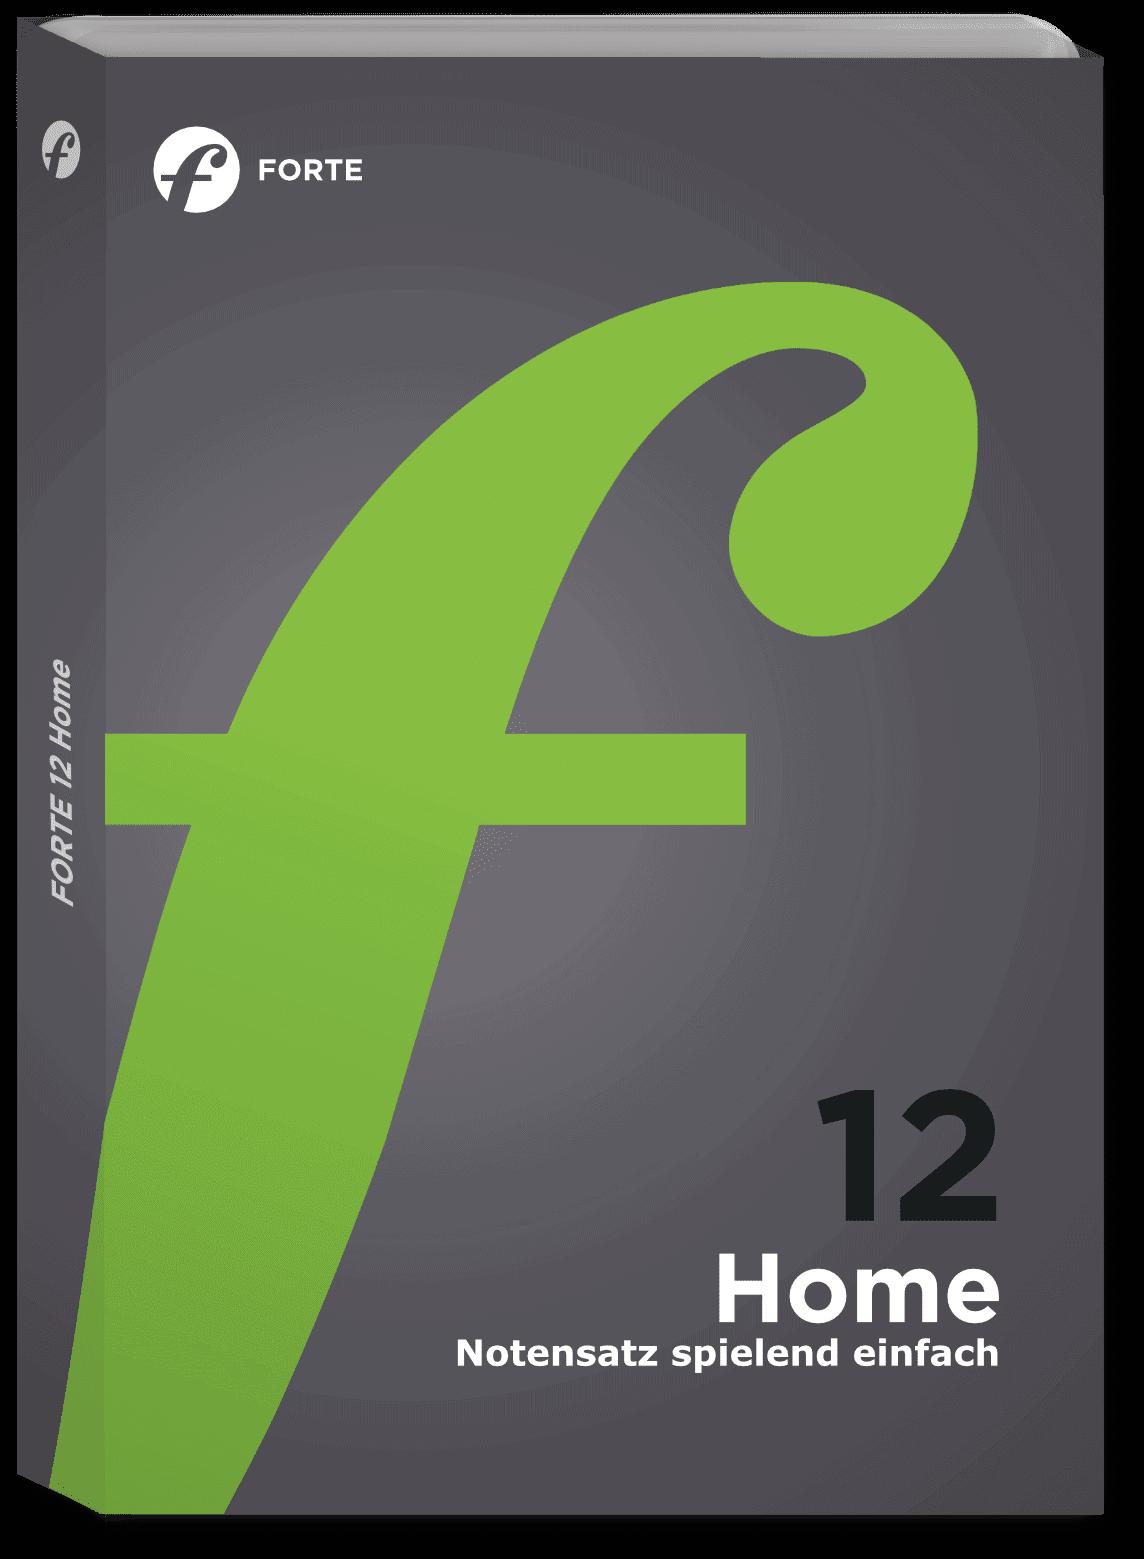 FORTE 12 Home